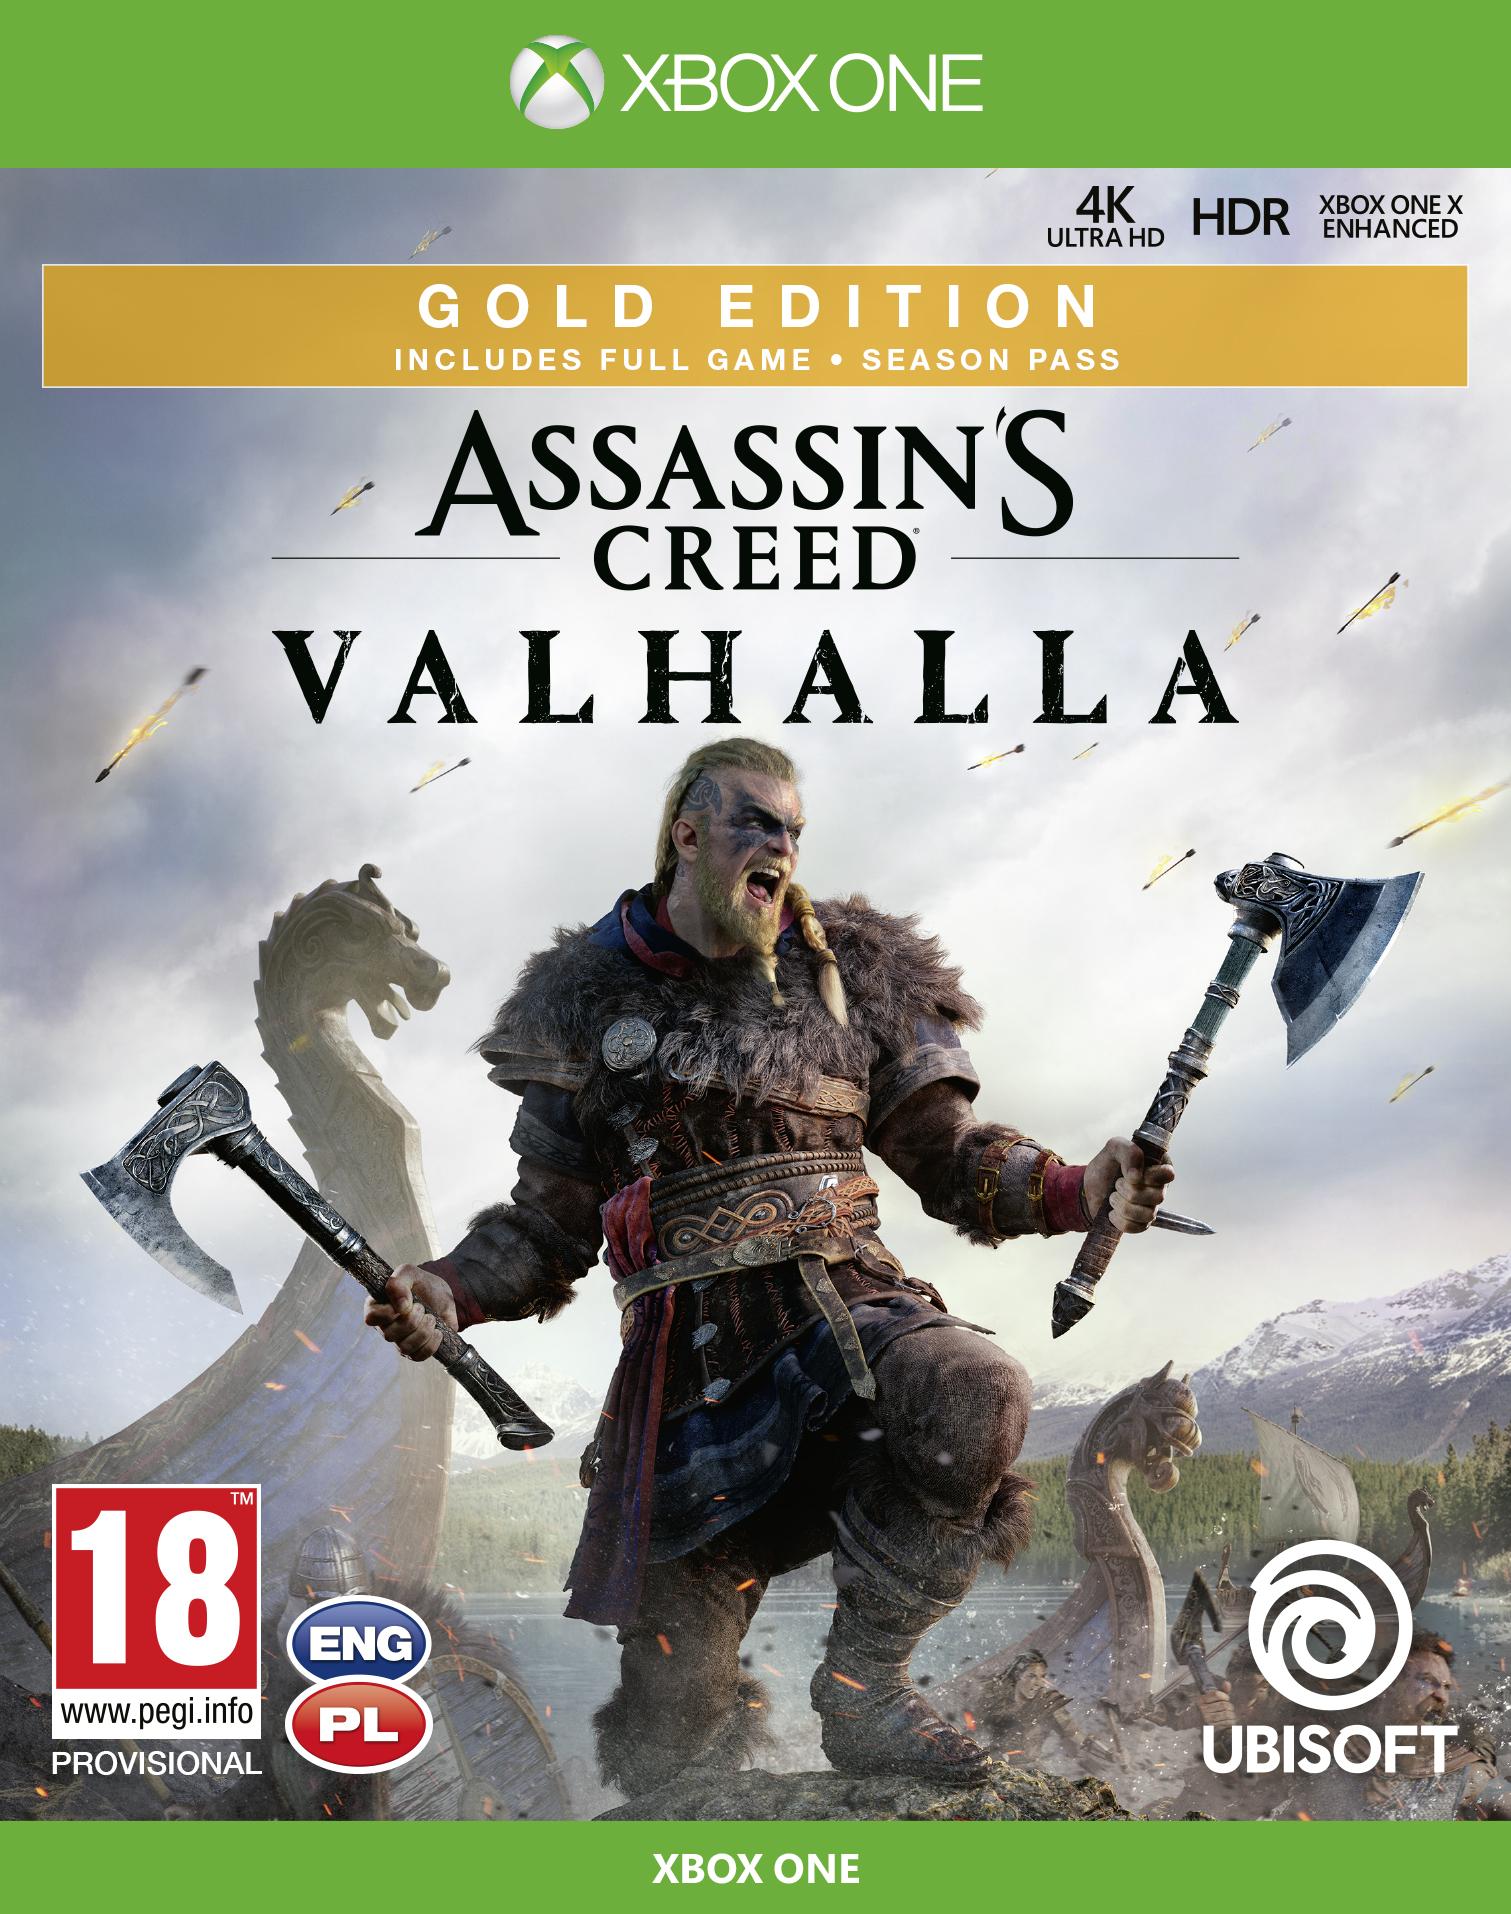 Assassin's Creed Valhalla Gold Edition (XOne) + BONUS